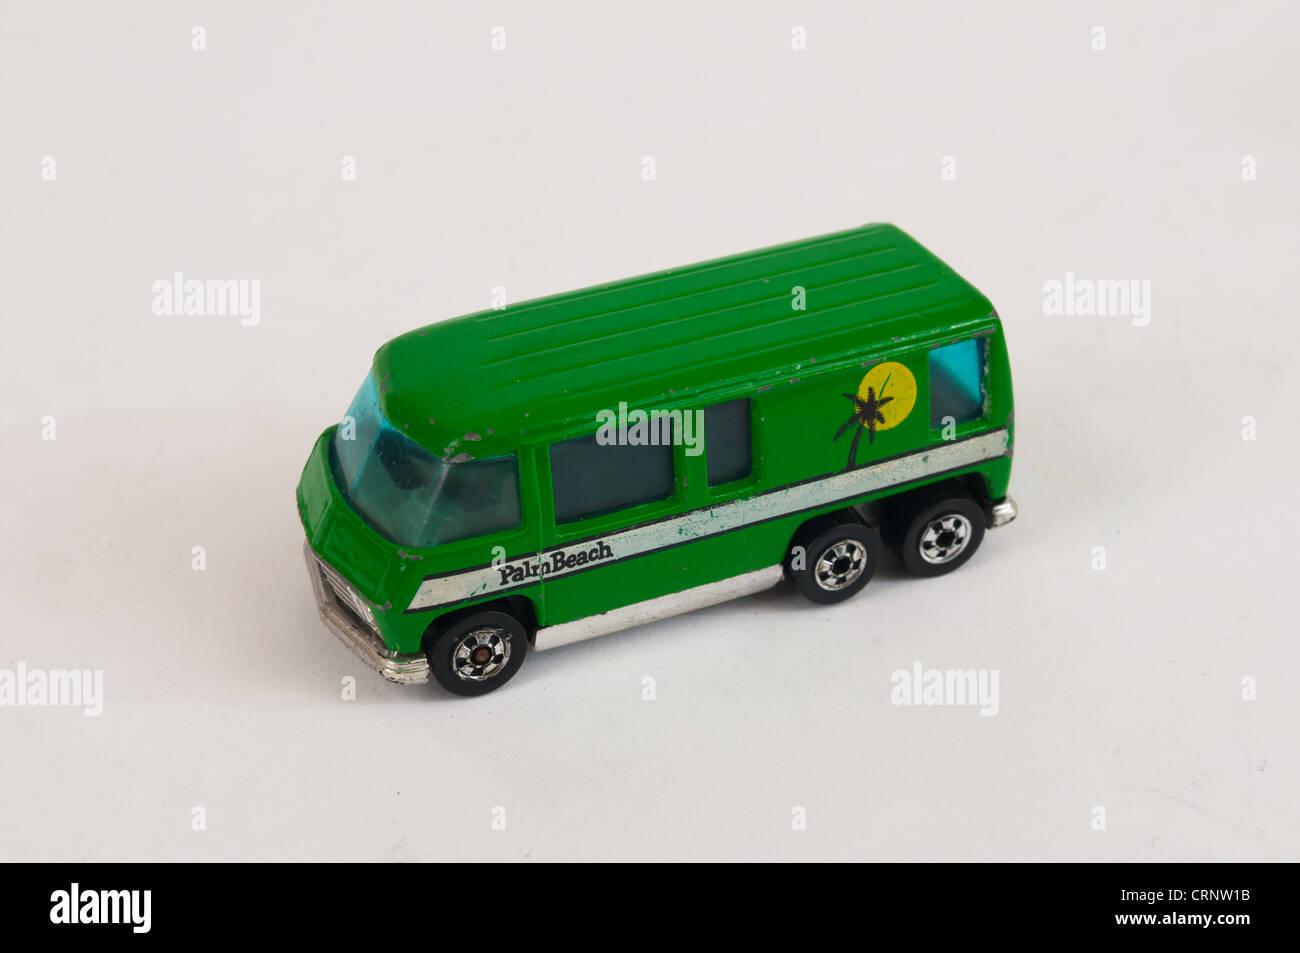 Hot Wheels Palm Beach Motor Home Mattel - Stock Image